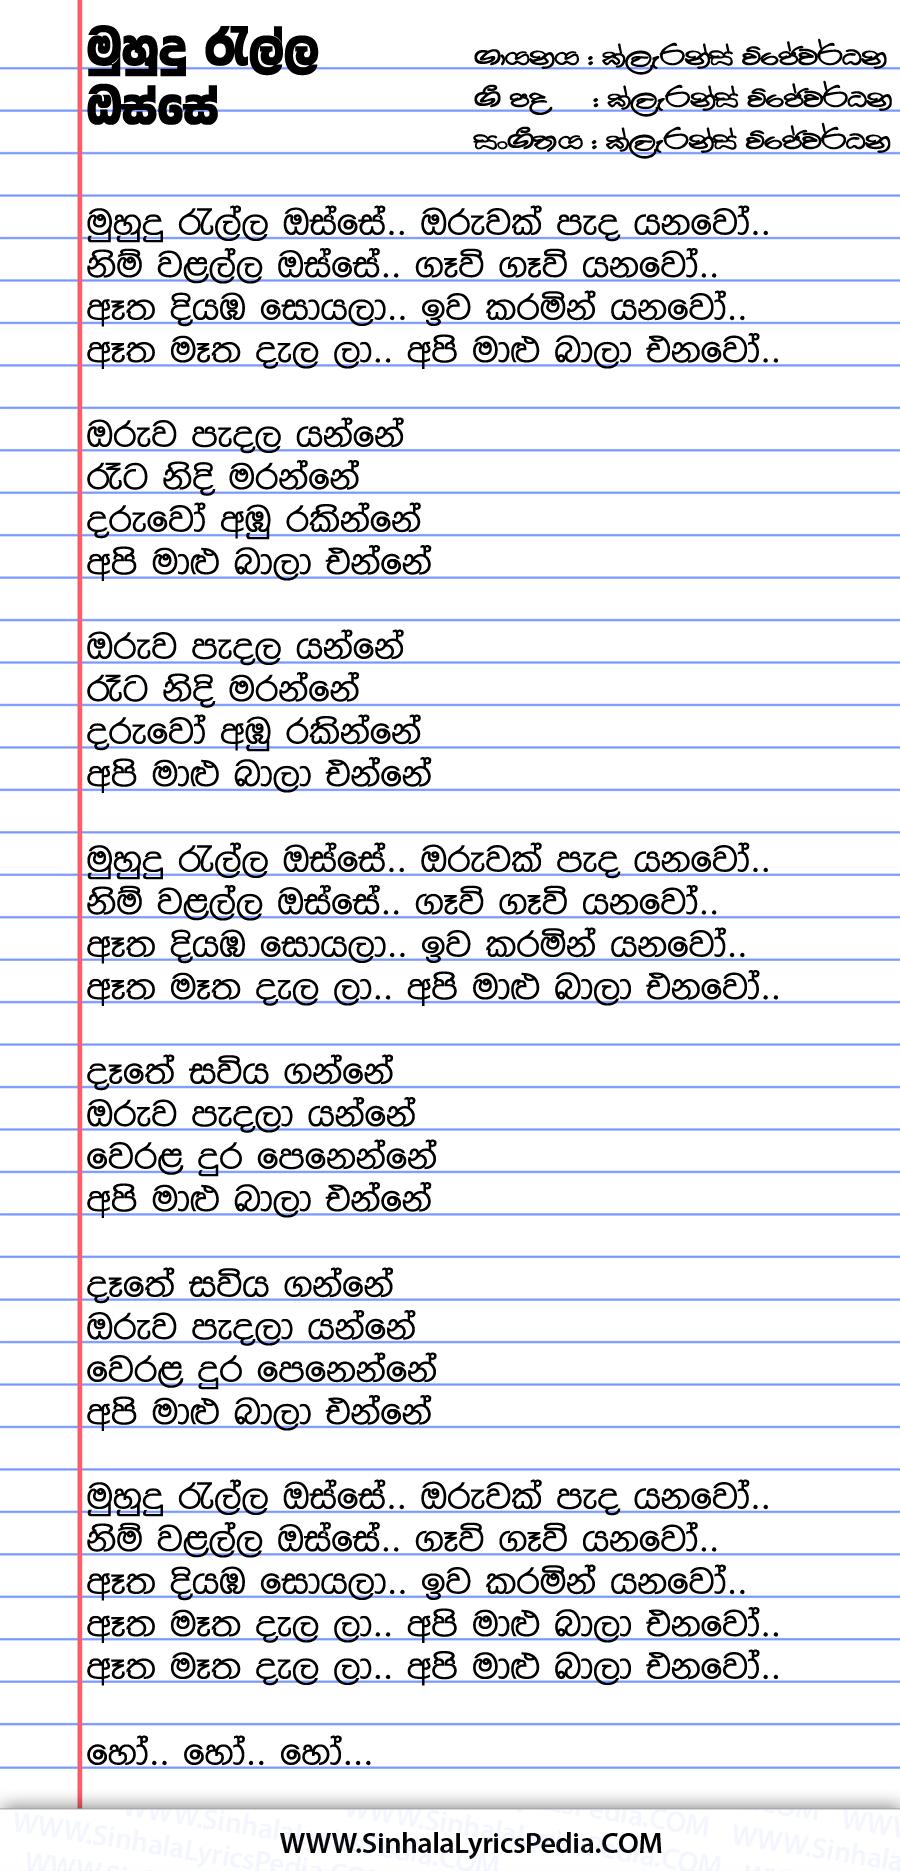 Muhudu Ralla Osse Song Lyrics